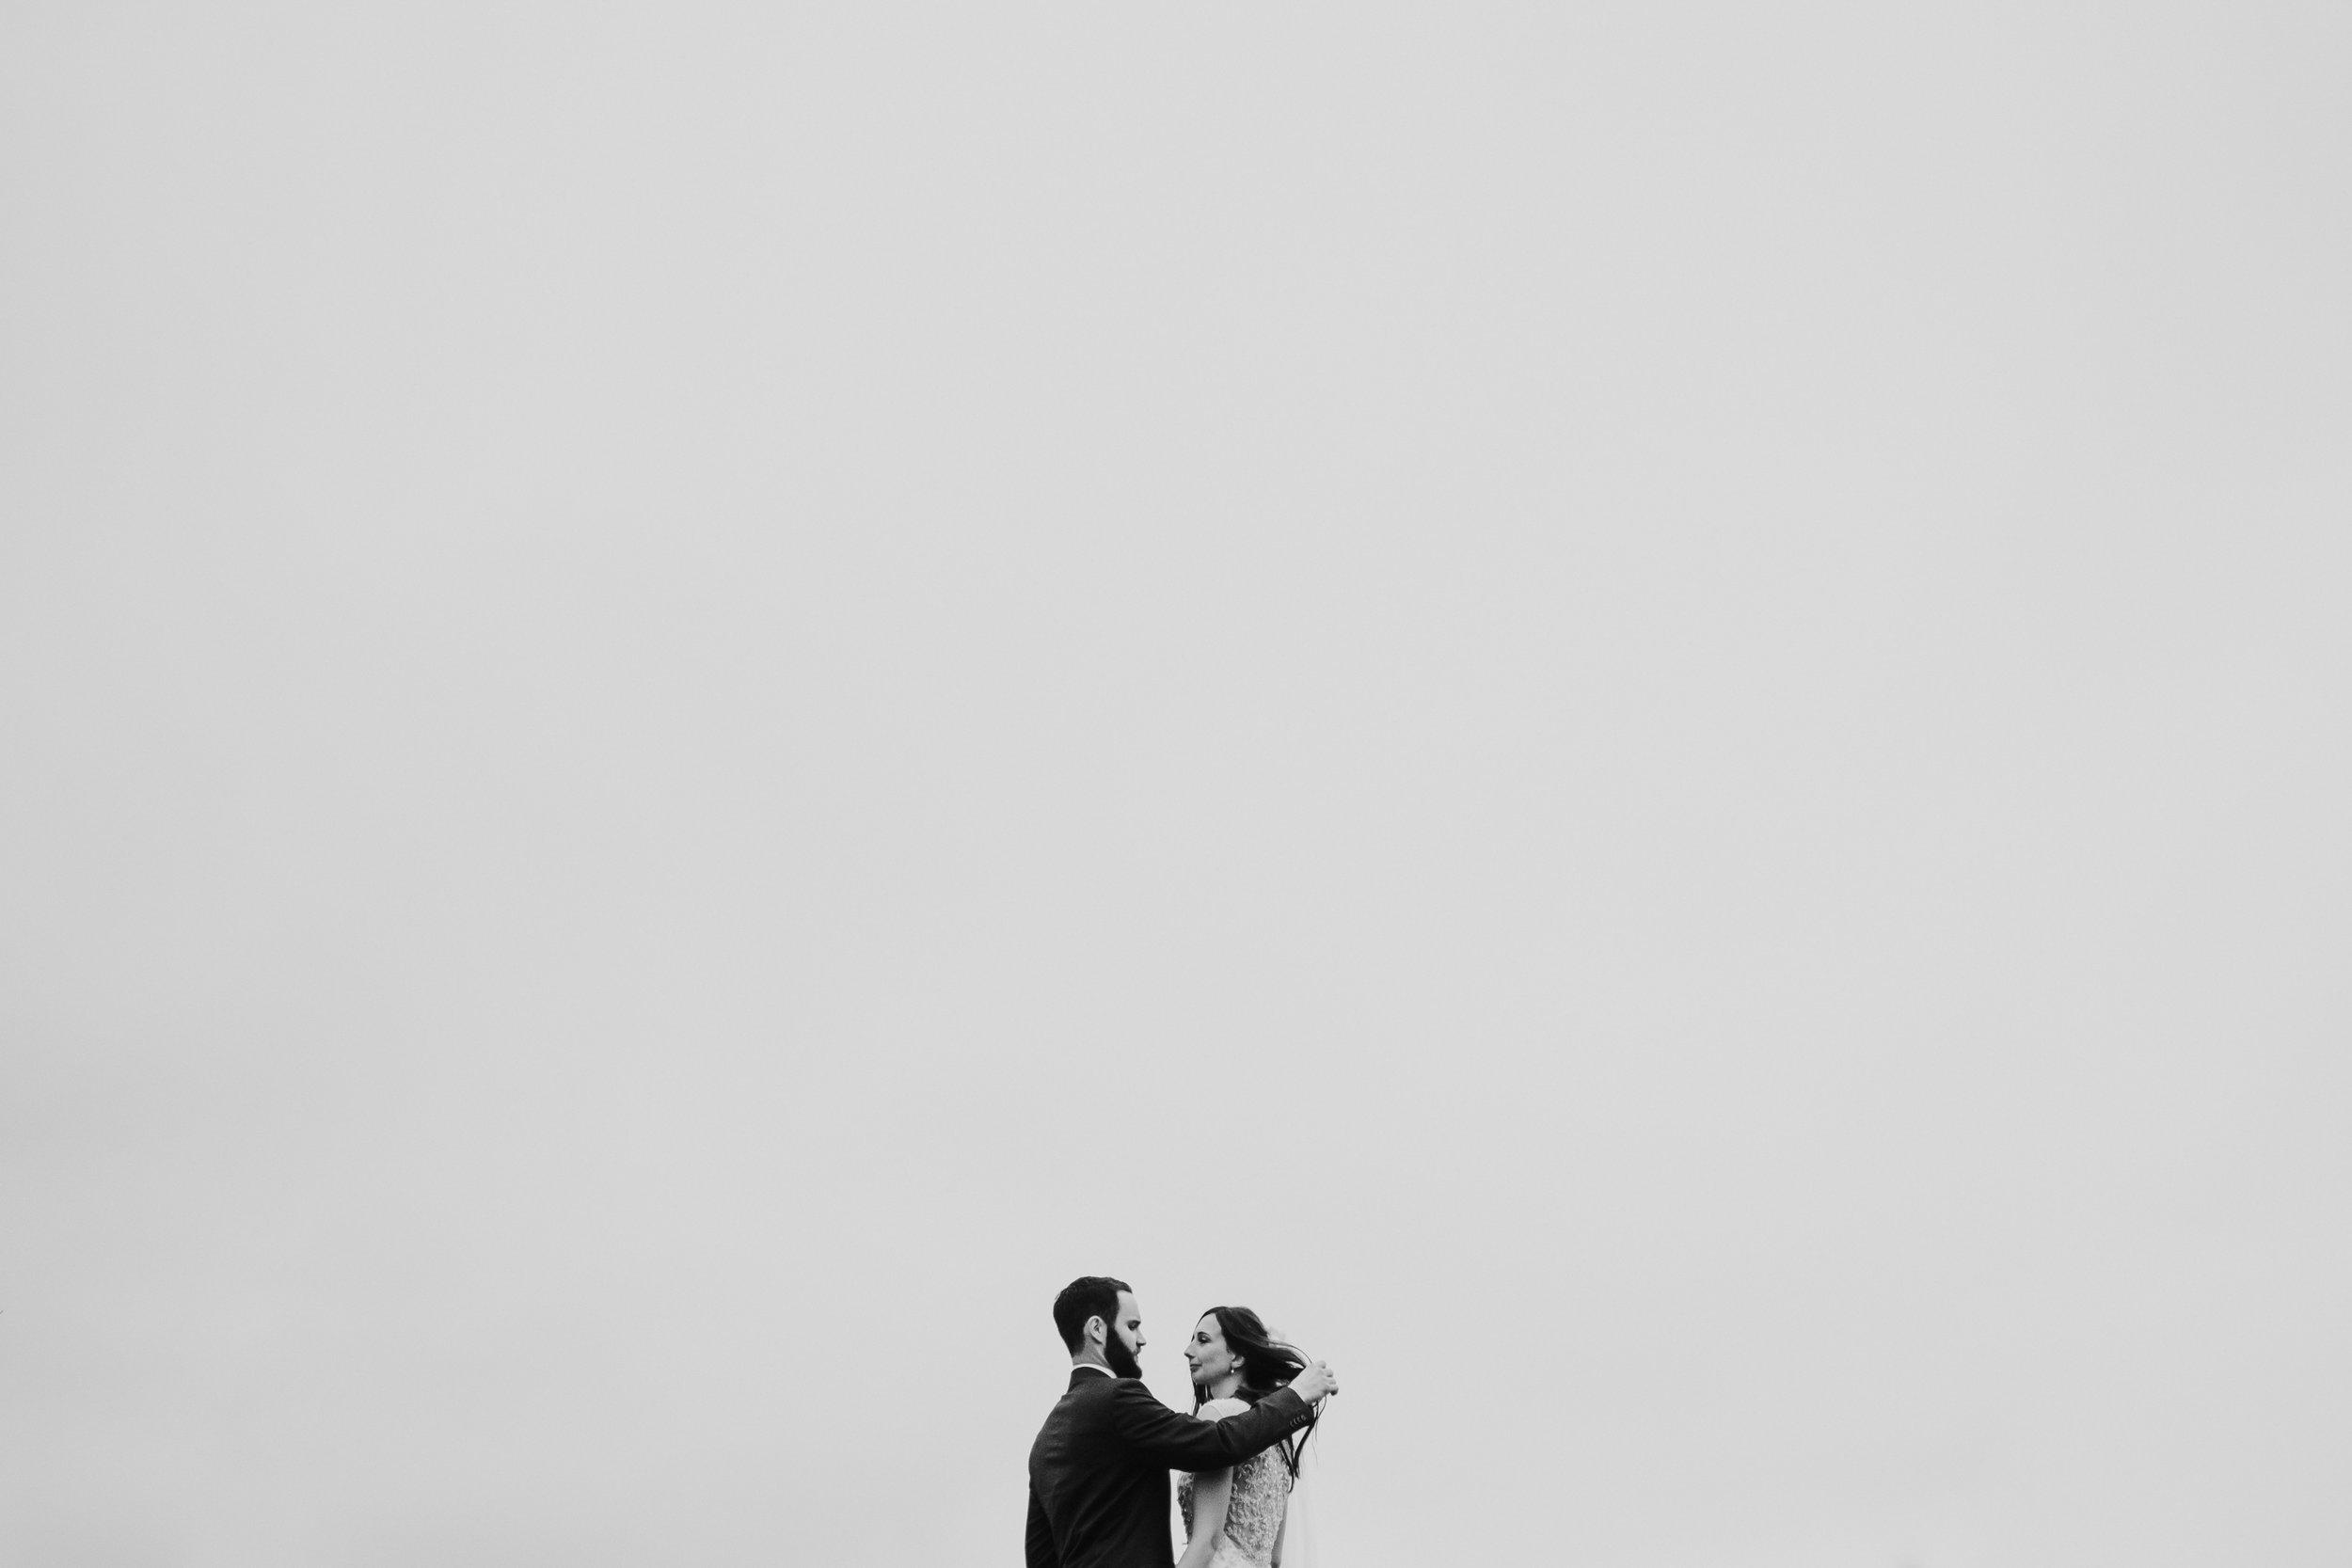 1 Upwaltham barn wedding photography creative joanna nicole photography1.jpg